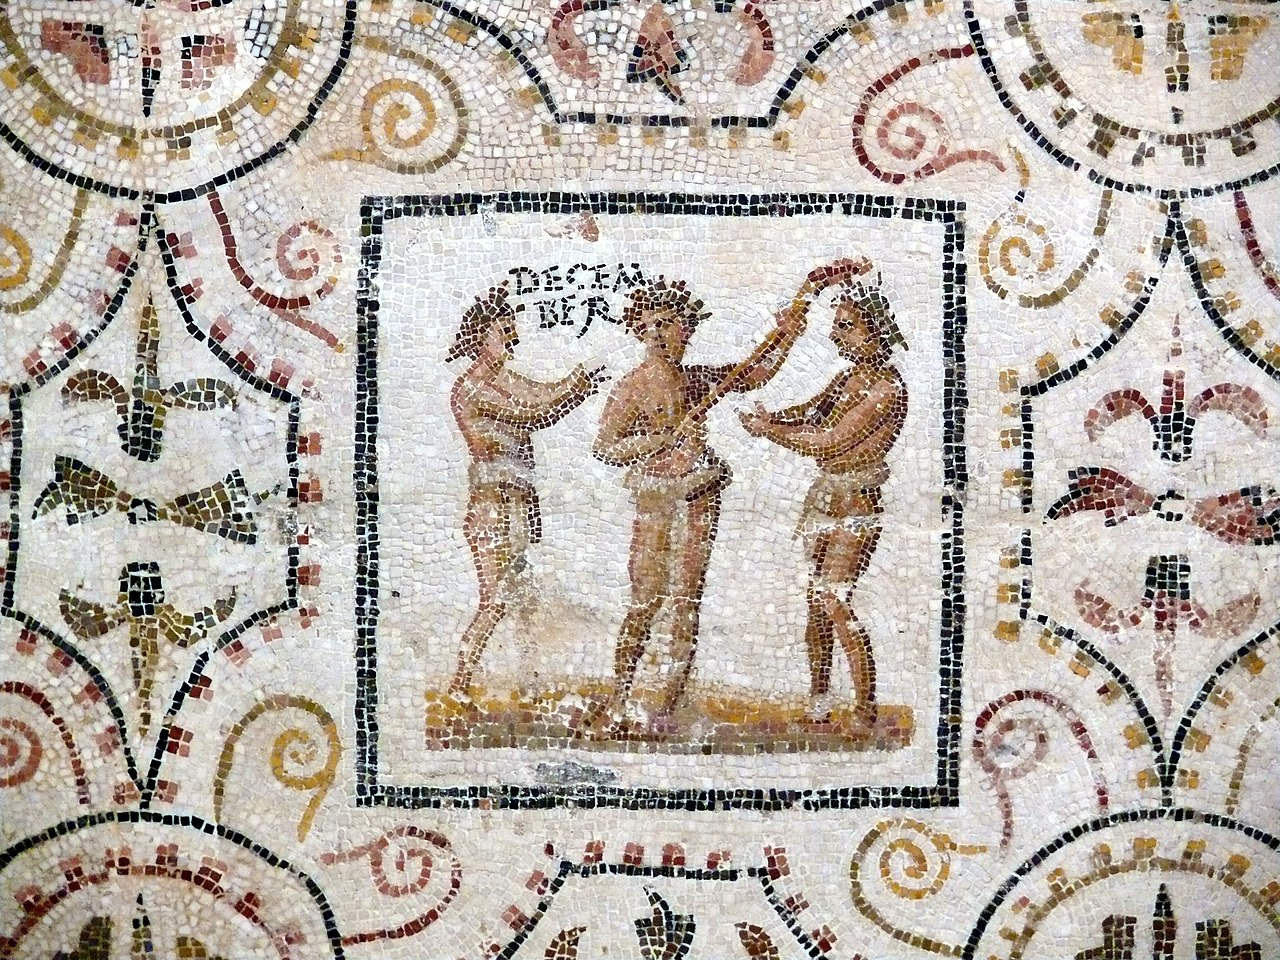 Sousse mosaic calendar December.JPG